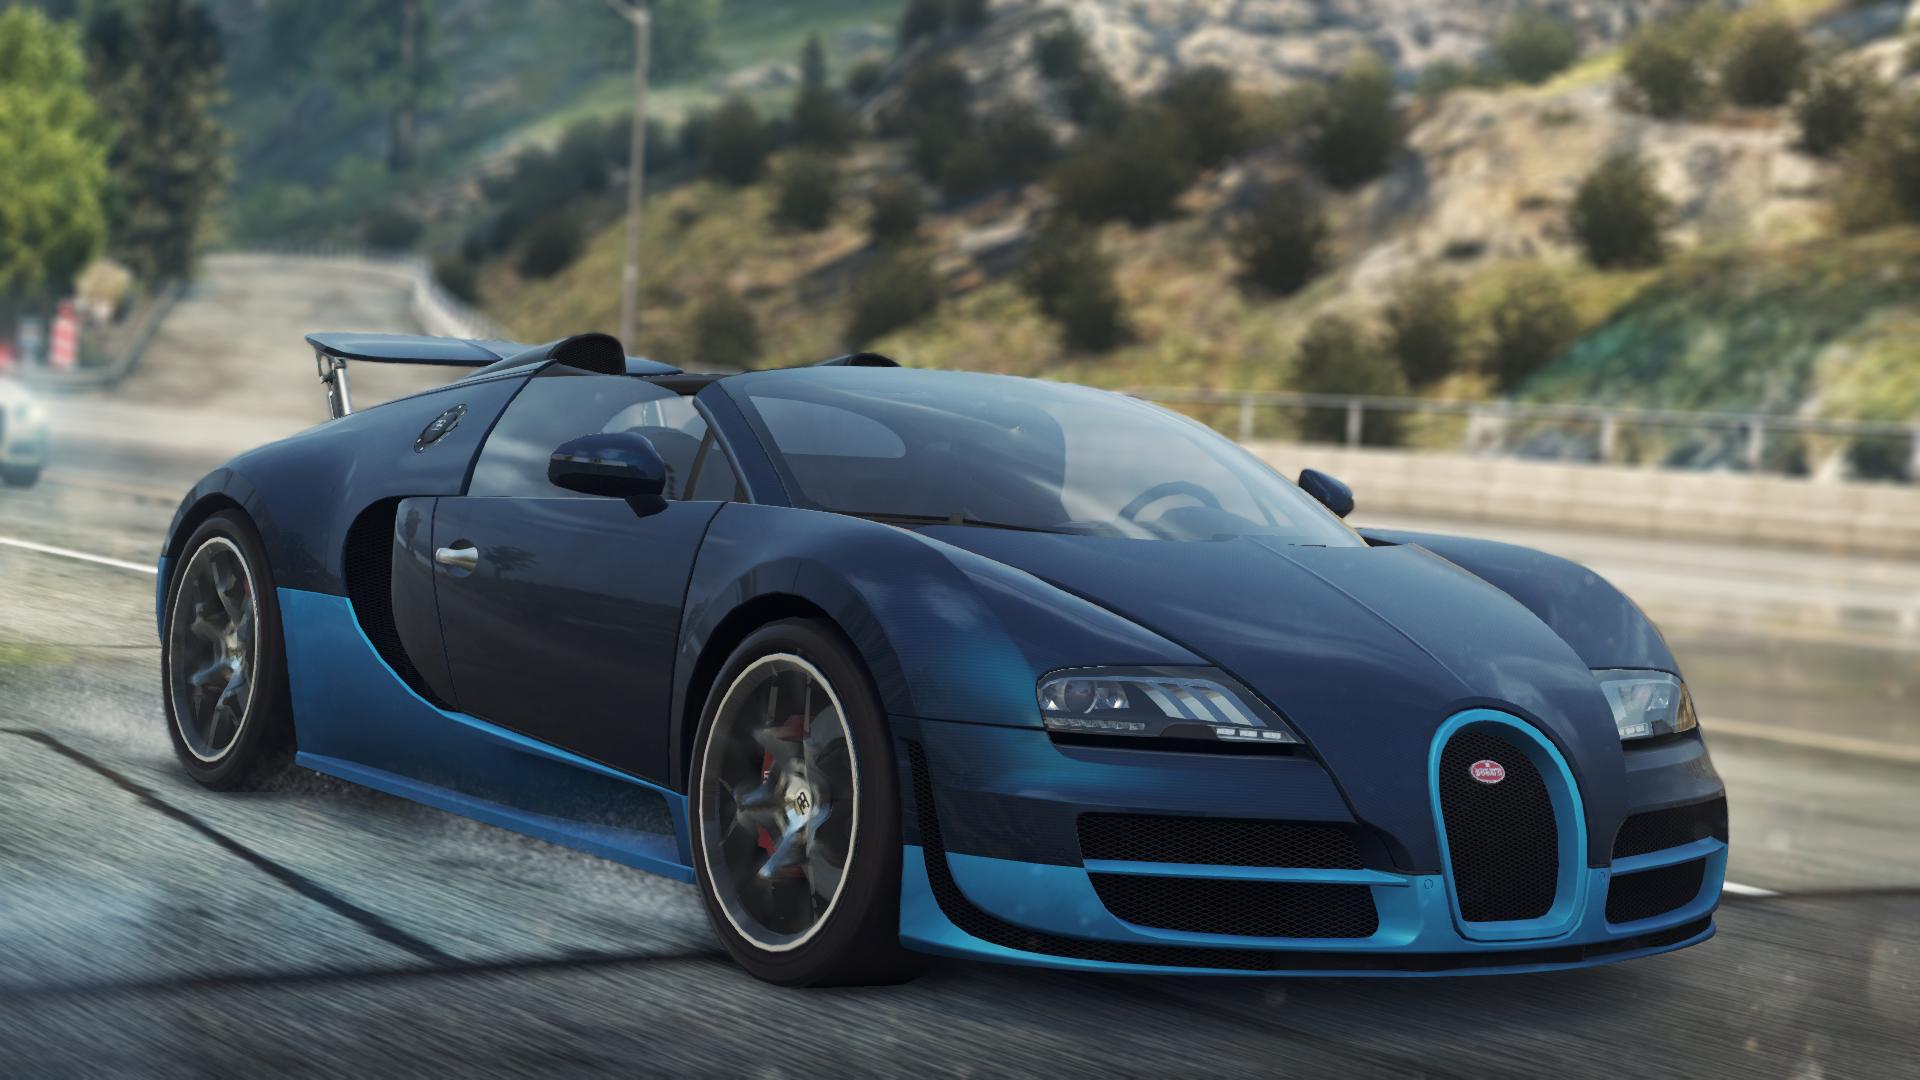 bugatti_veyron_grand_sport_vitesse_by_acersense-d615u15 Astounding Bugatti Veyron Need for Speed World Cars Trend